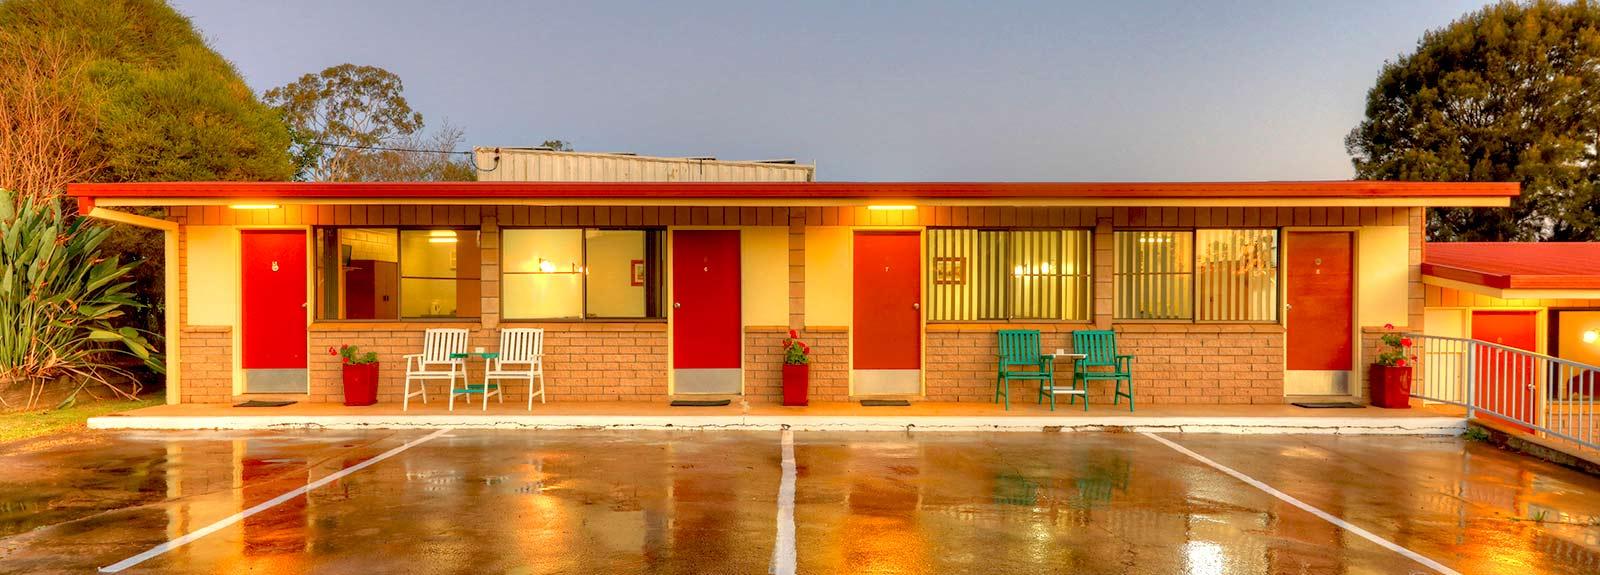 Murgon city motor inn motel accommodation in murgon qld for Civic centre motor inn